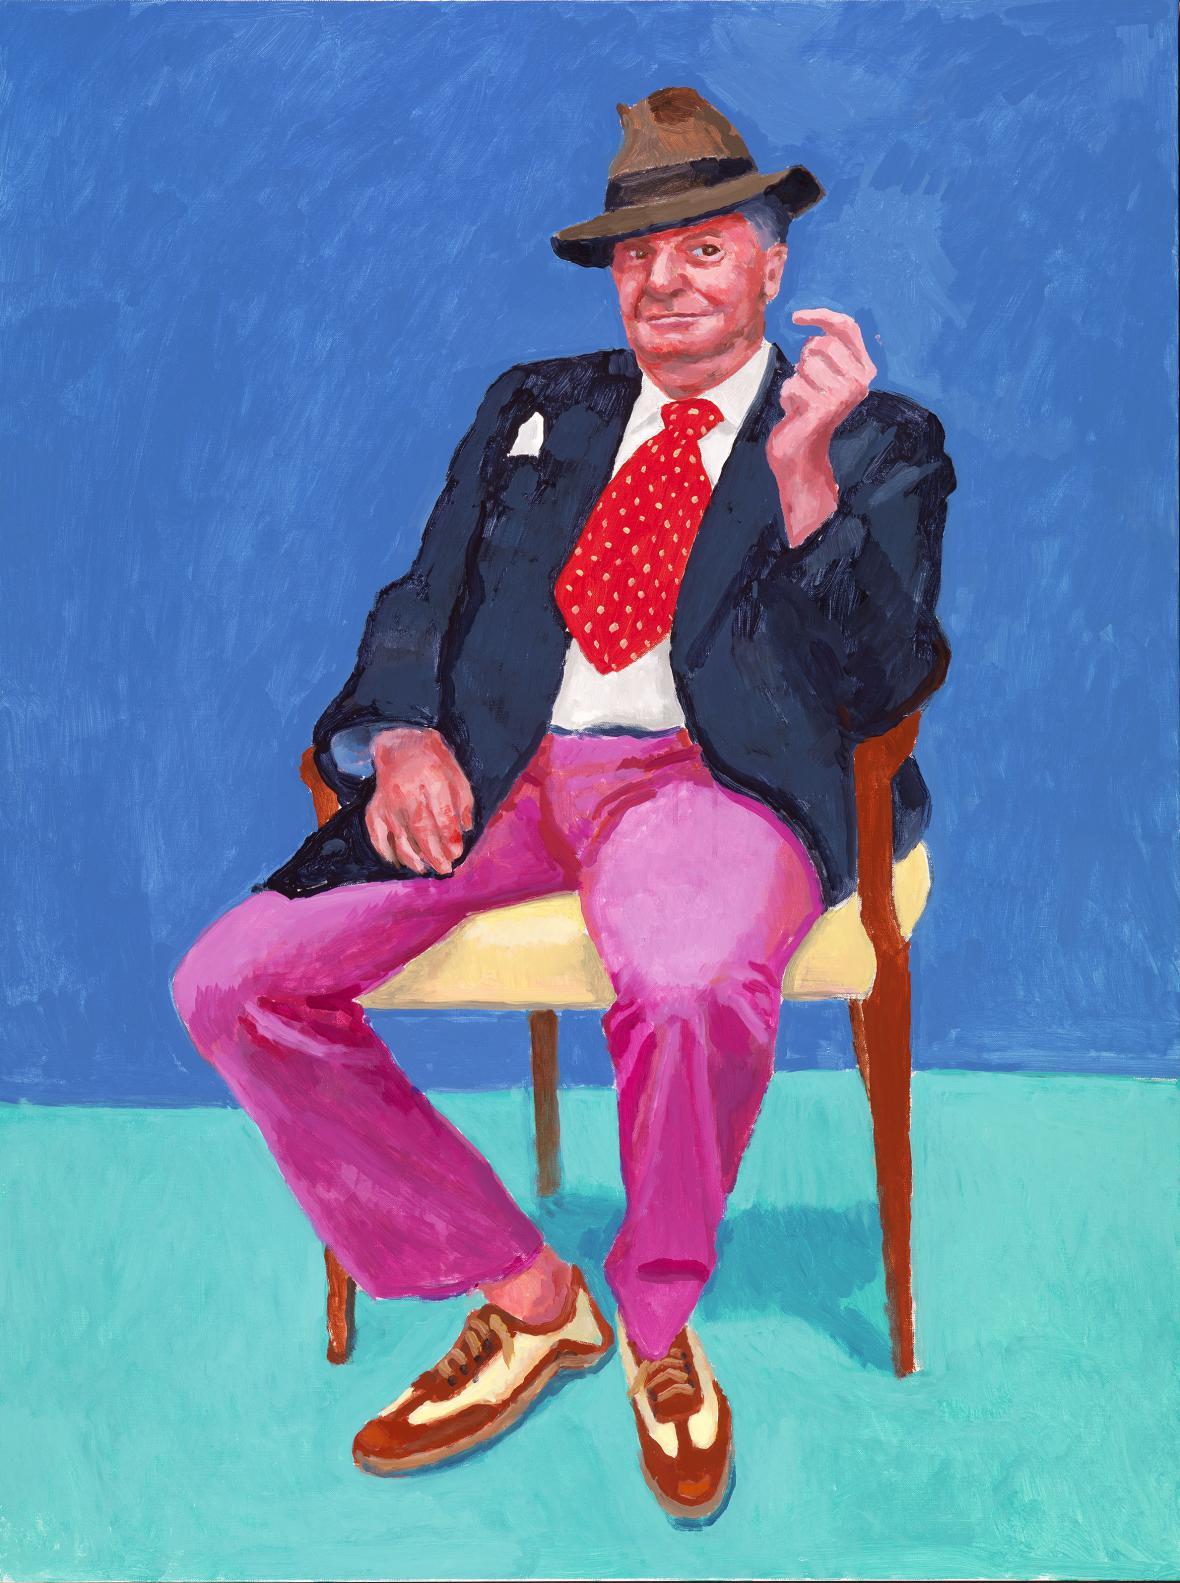 David Hockney / Barry Humphries, 2015